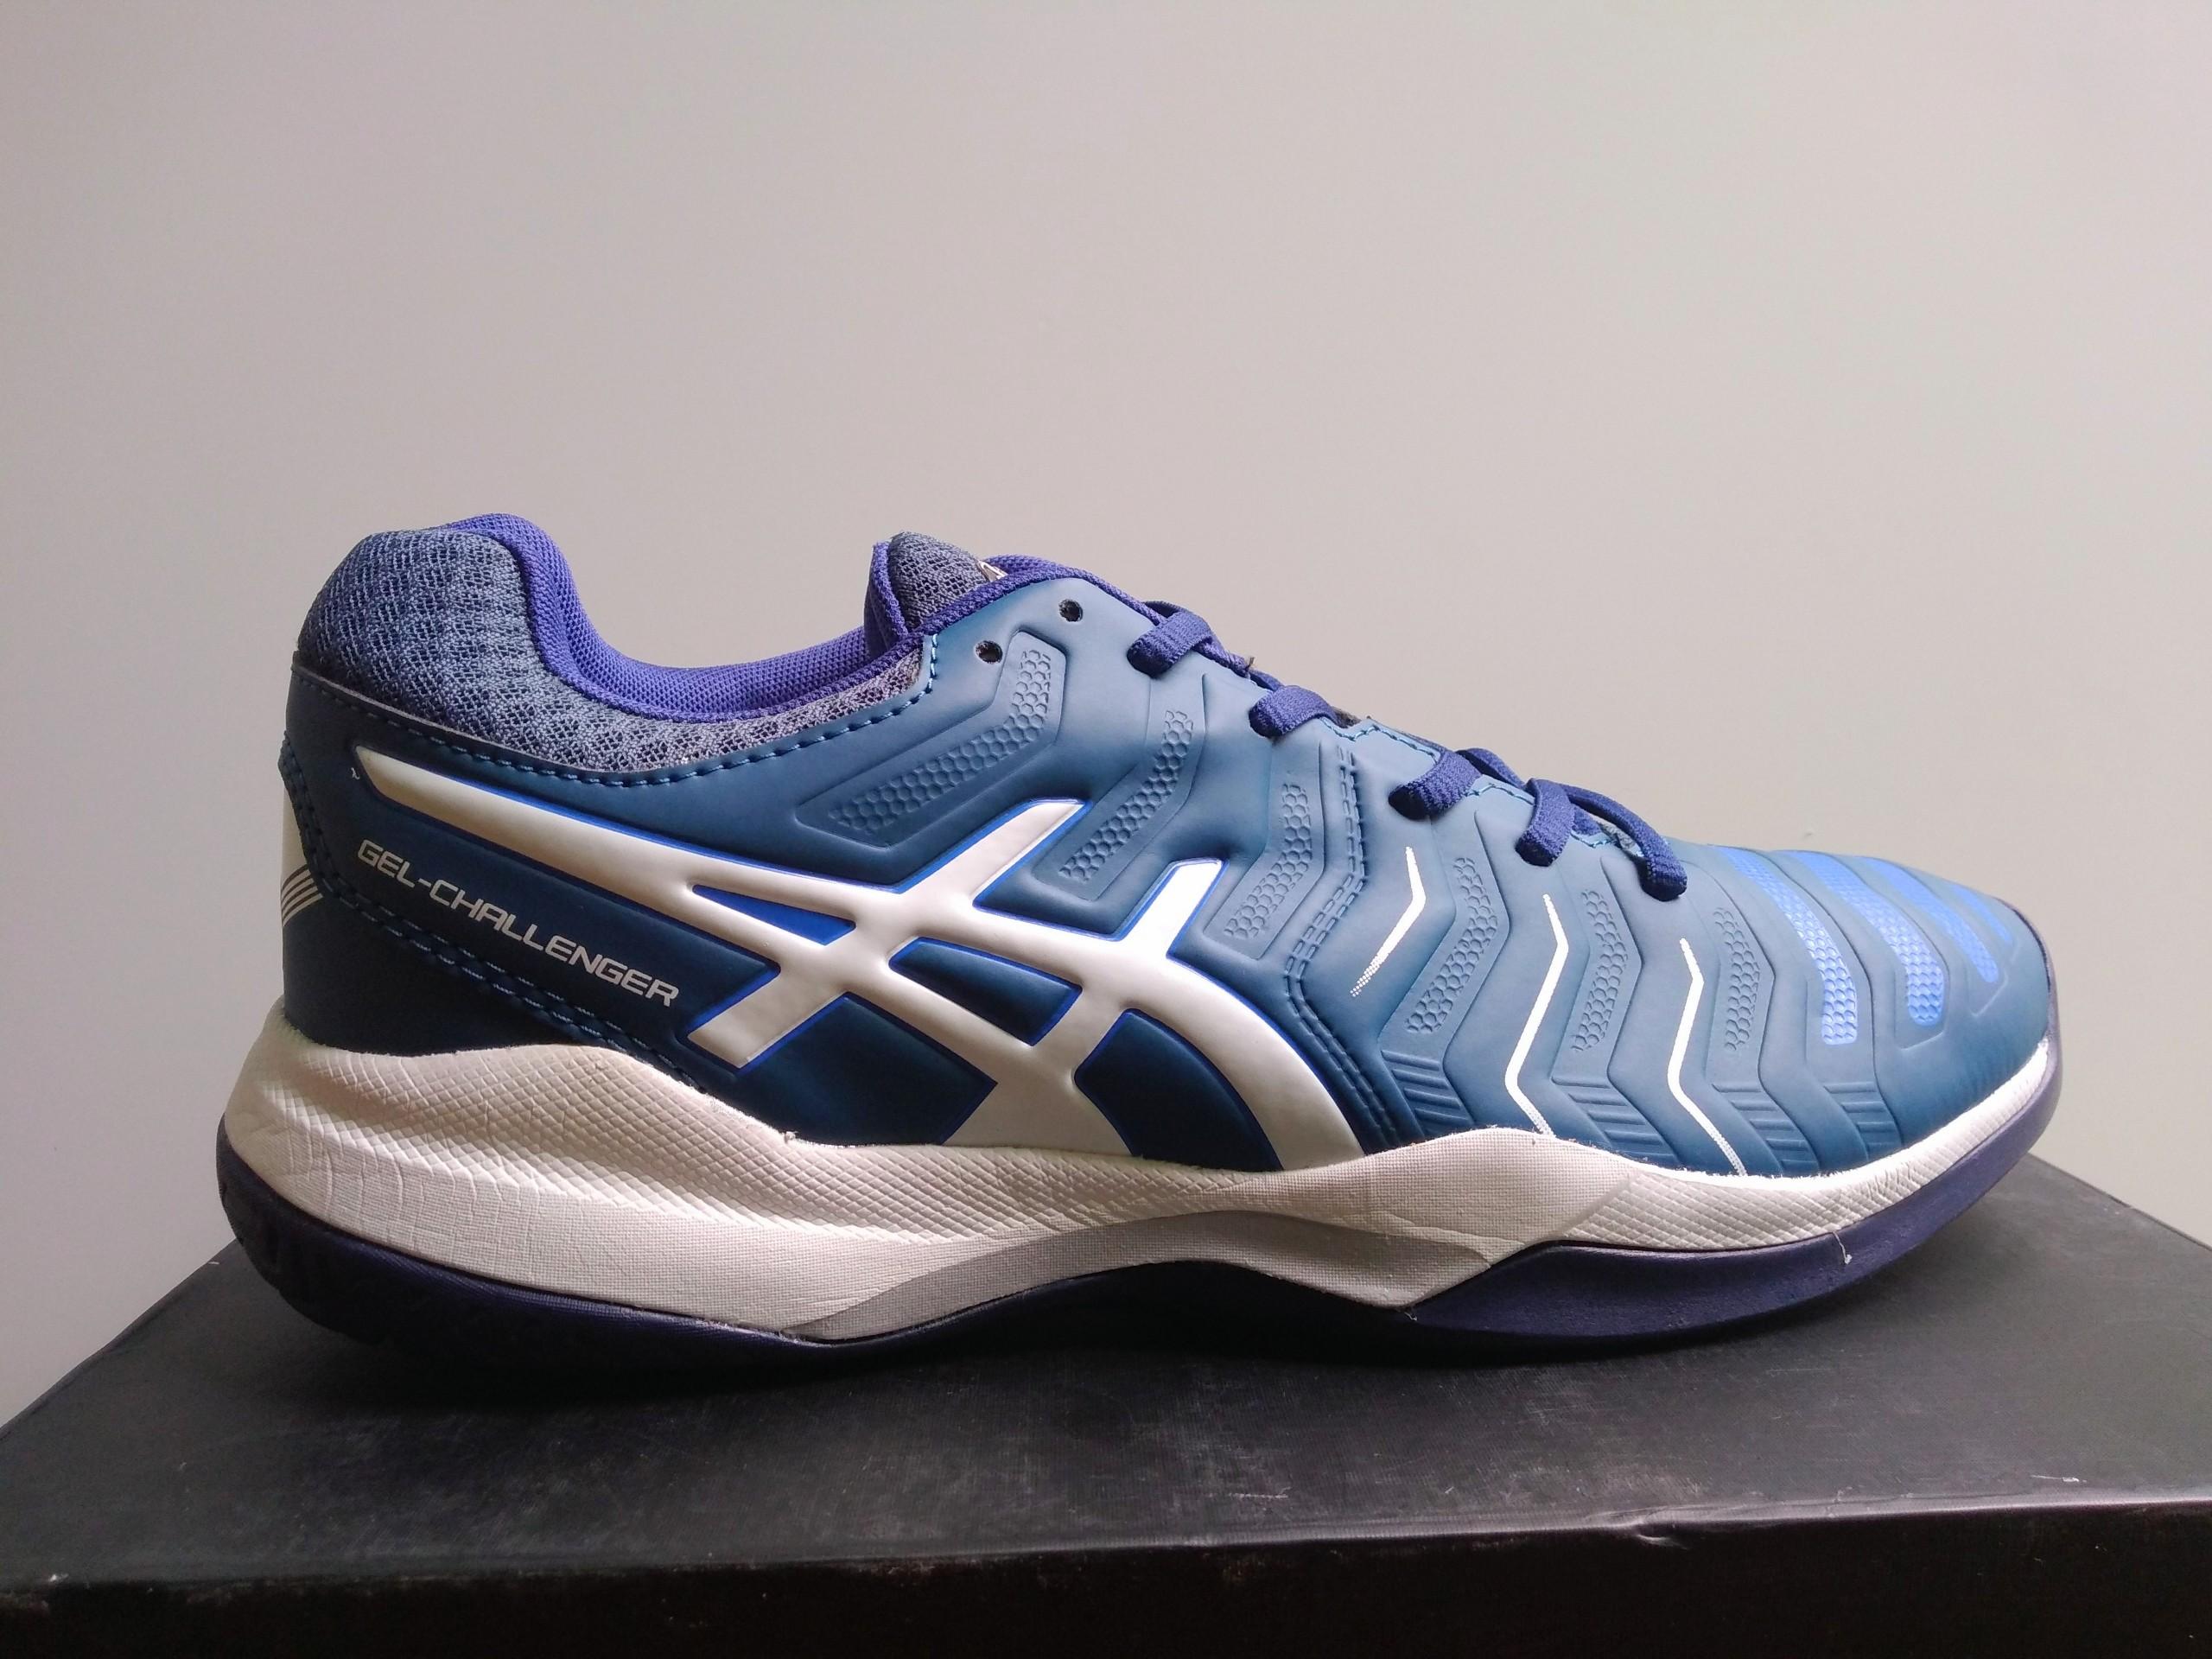 giày asics tennis tphcm